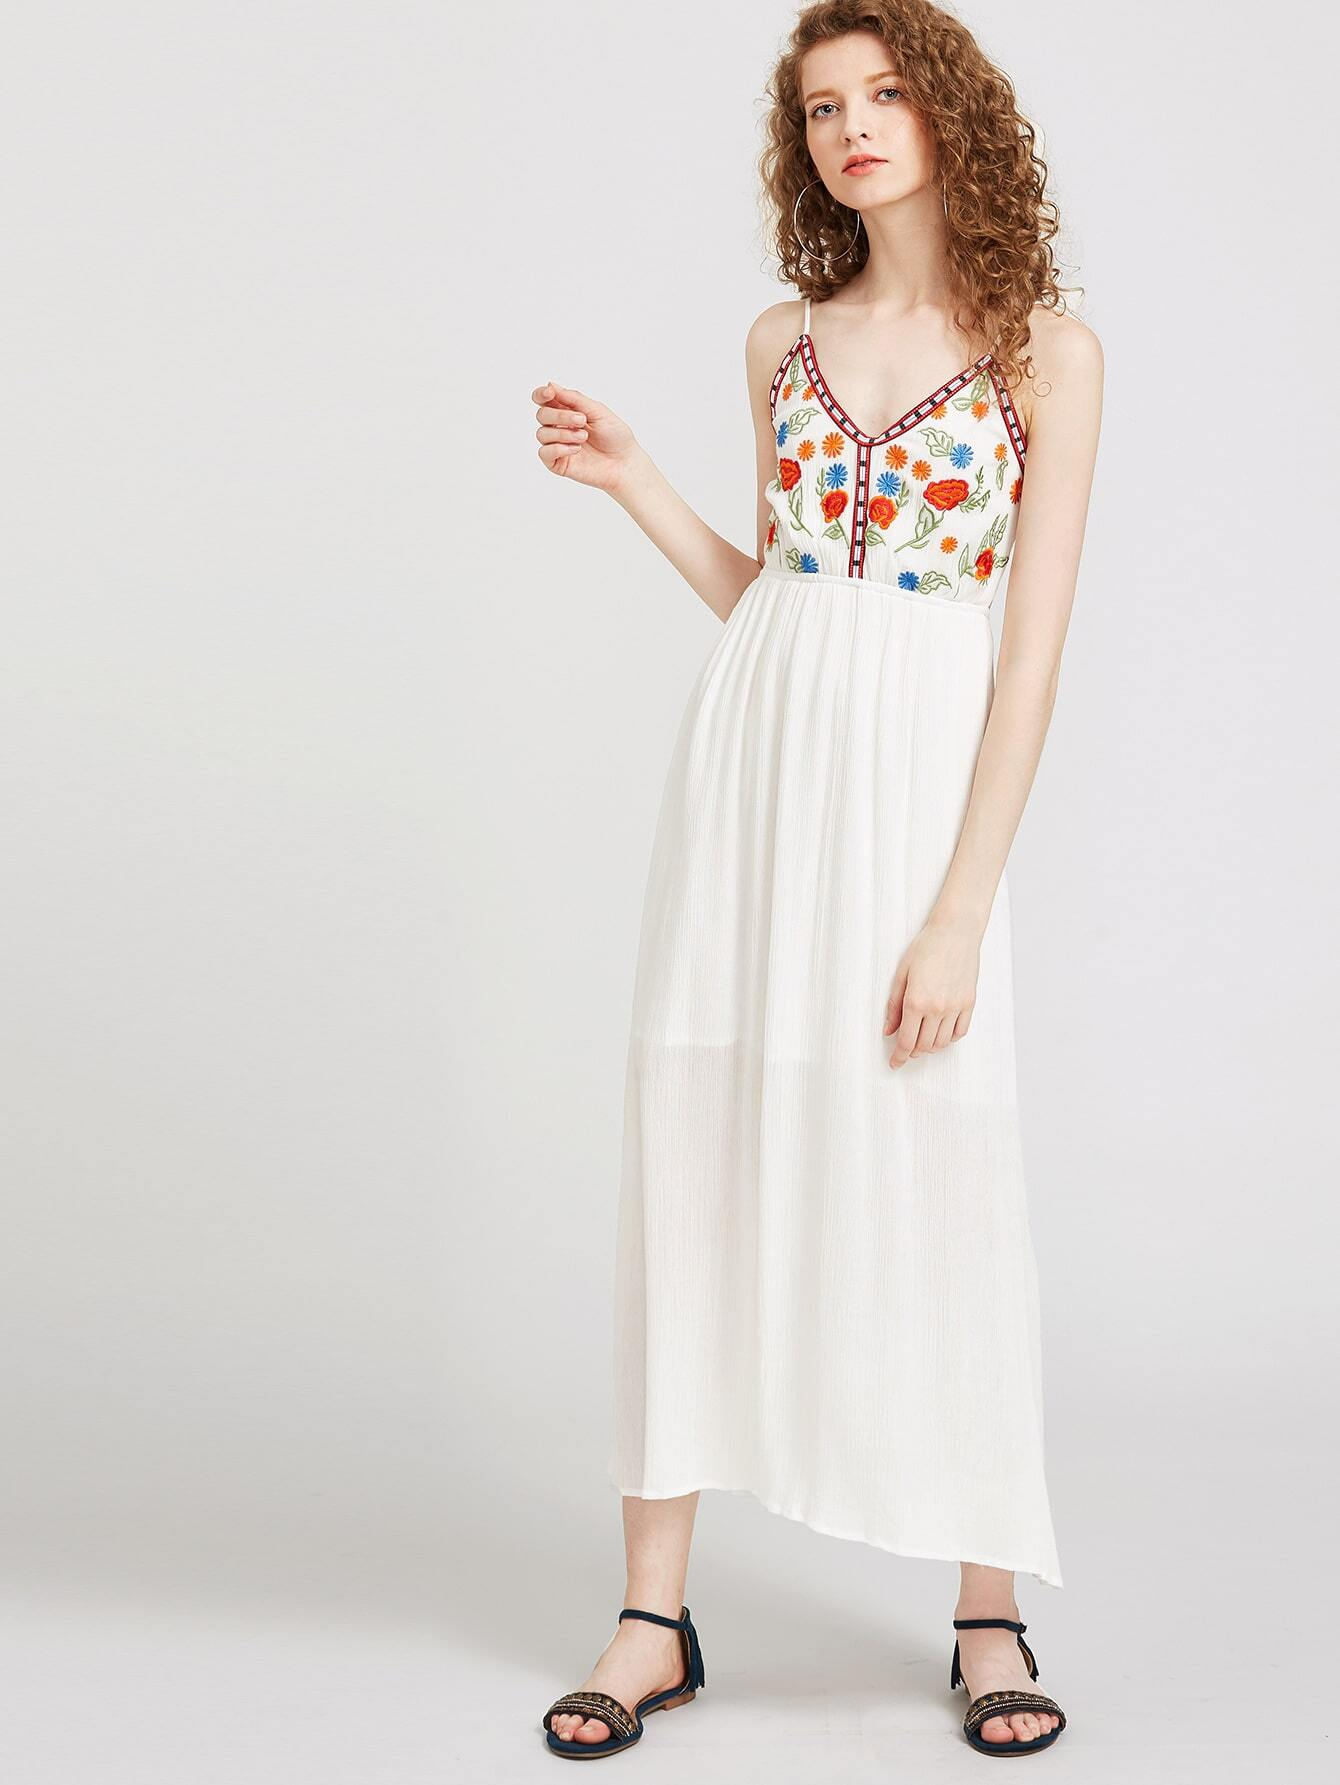 Embroidery Slip Open Back Dress dress170407002